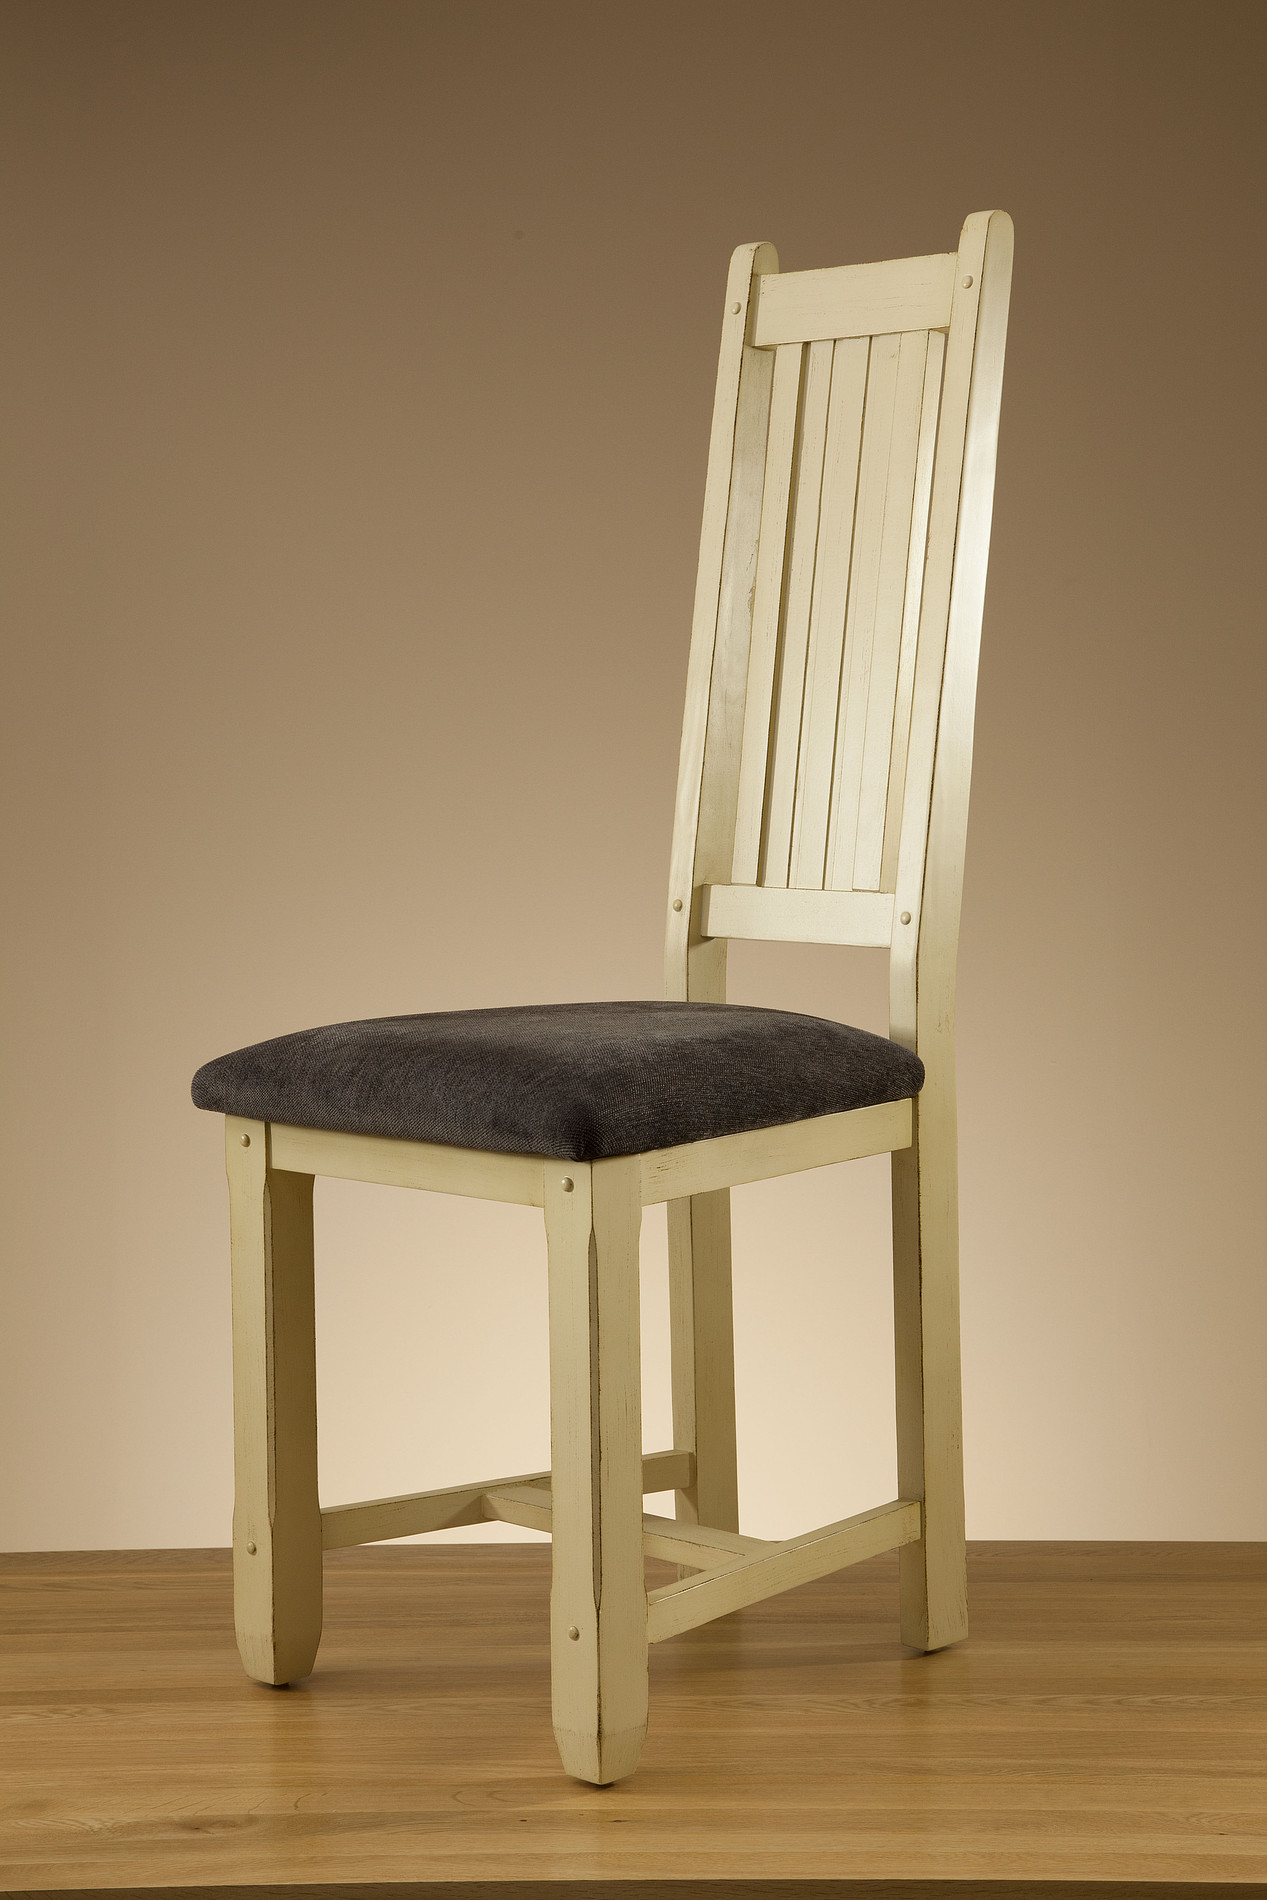 rustic dining chairs uk black and white chair phoenix shabby chic oak plain fabric